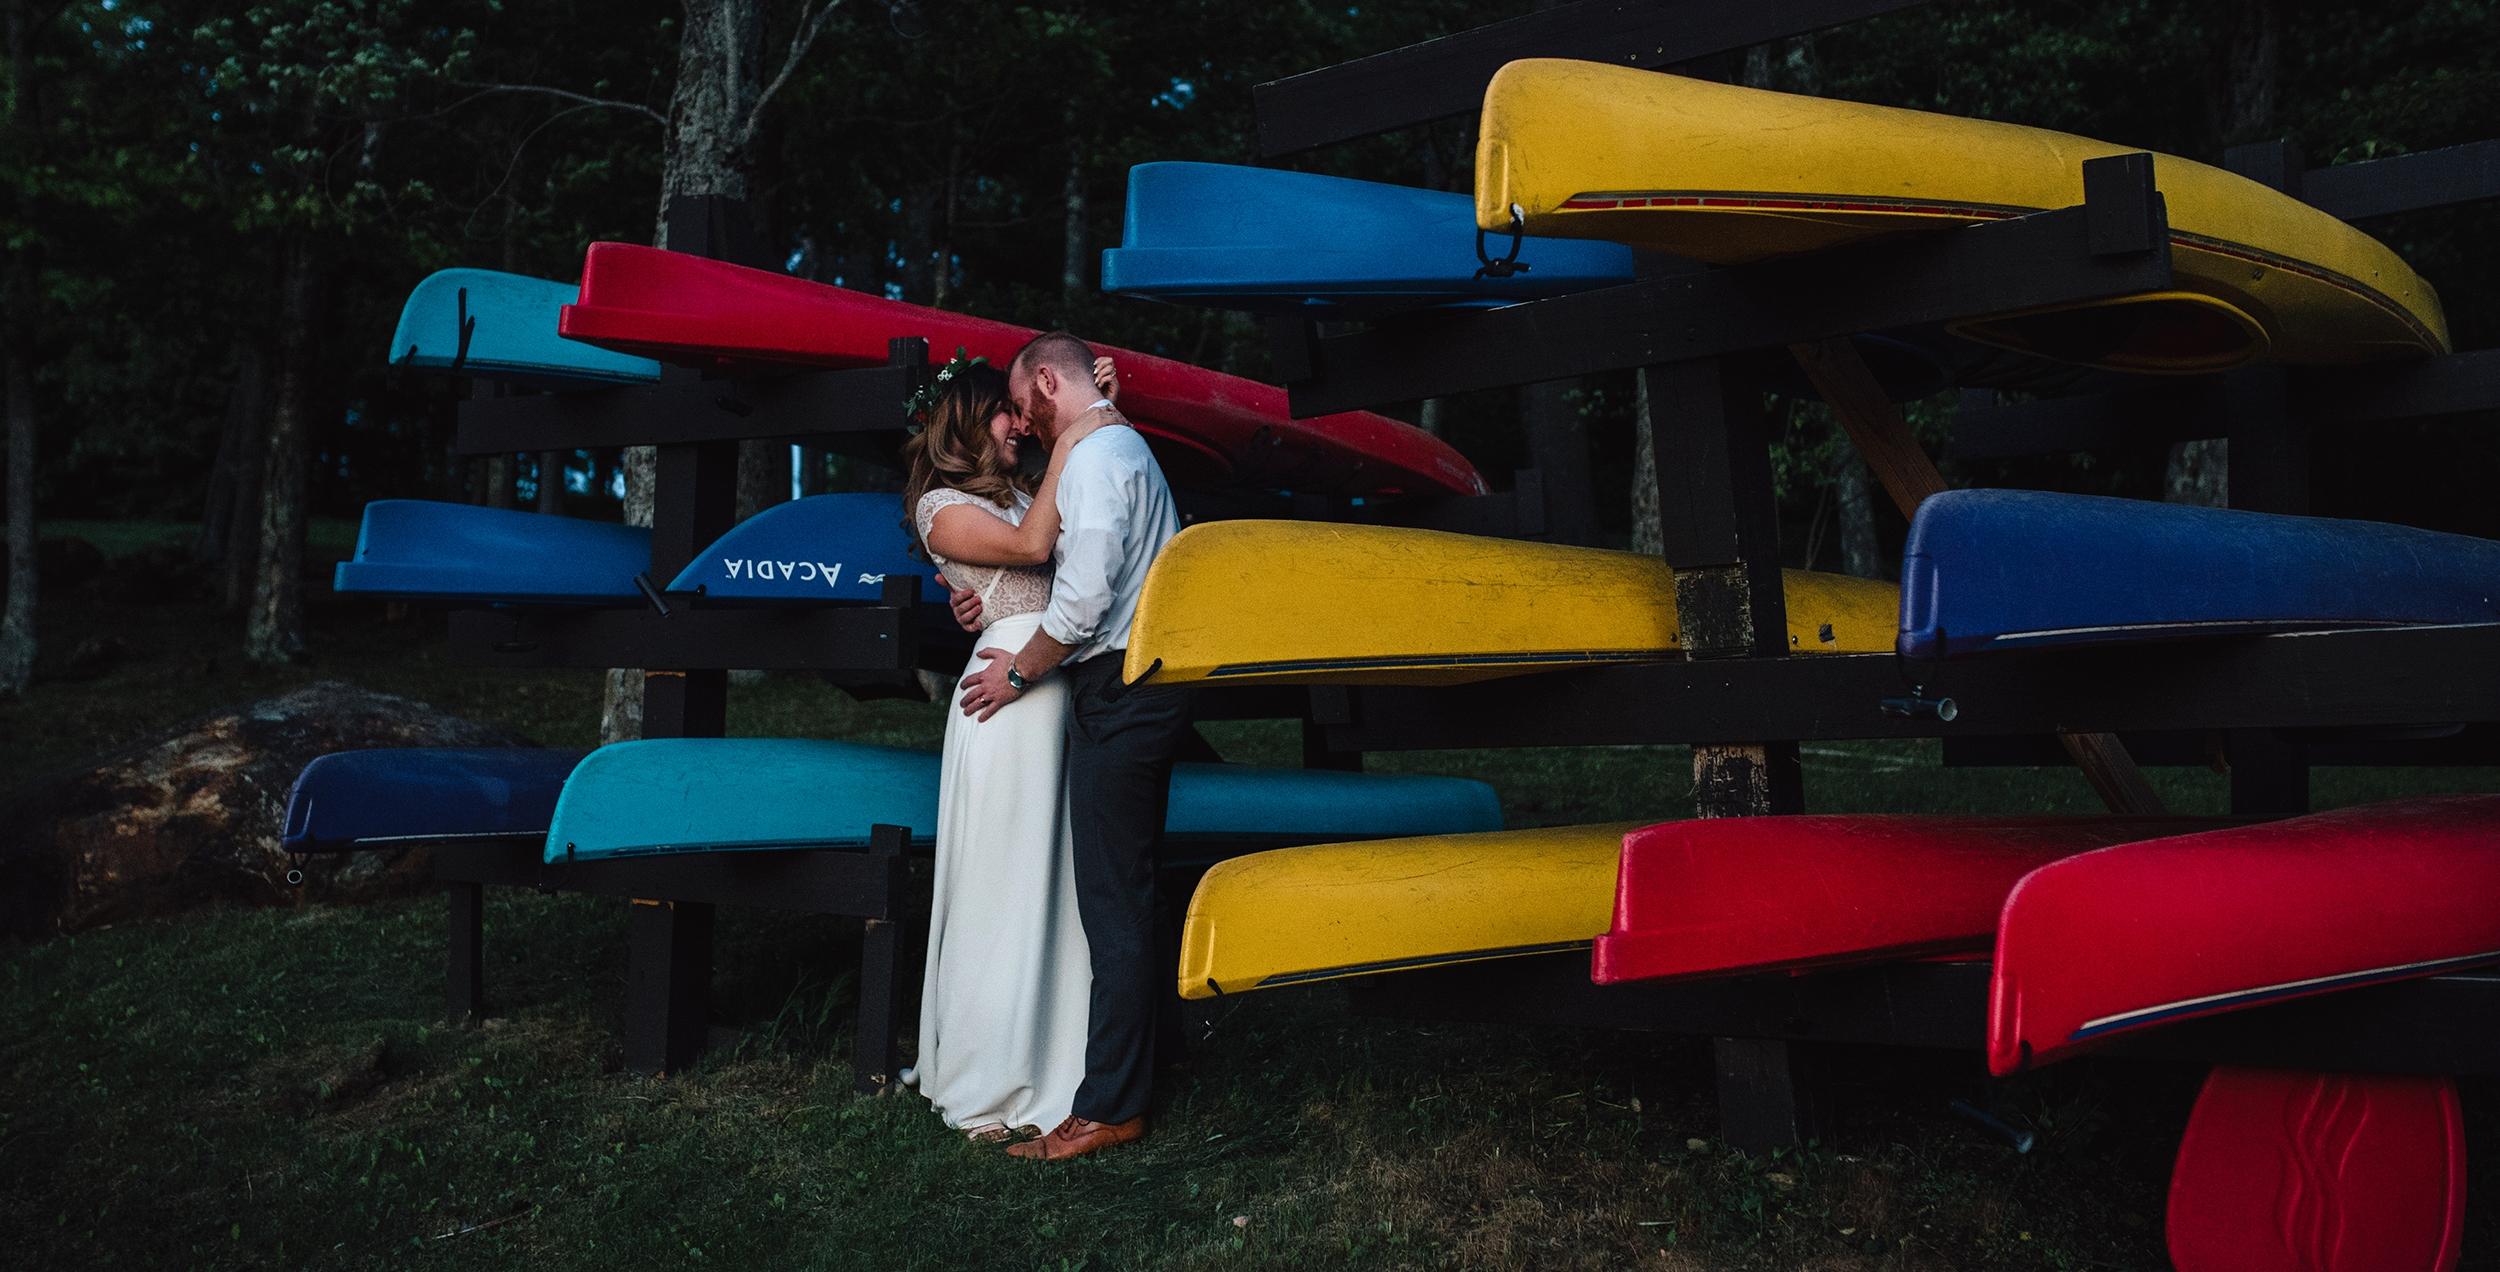 Summer Camp Wedding Outdoor Novella Photography Doris and James 2.jpg